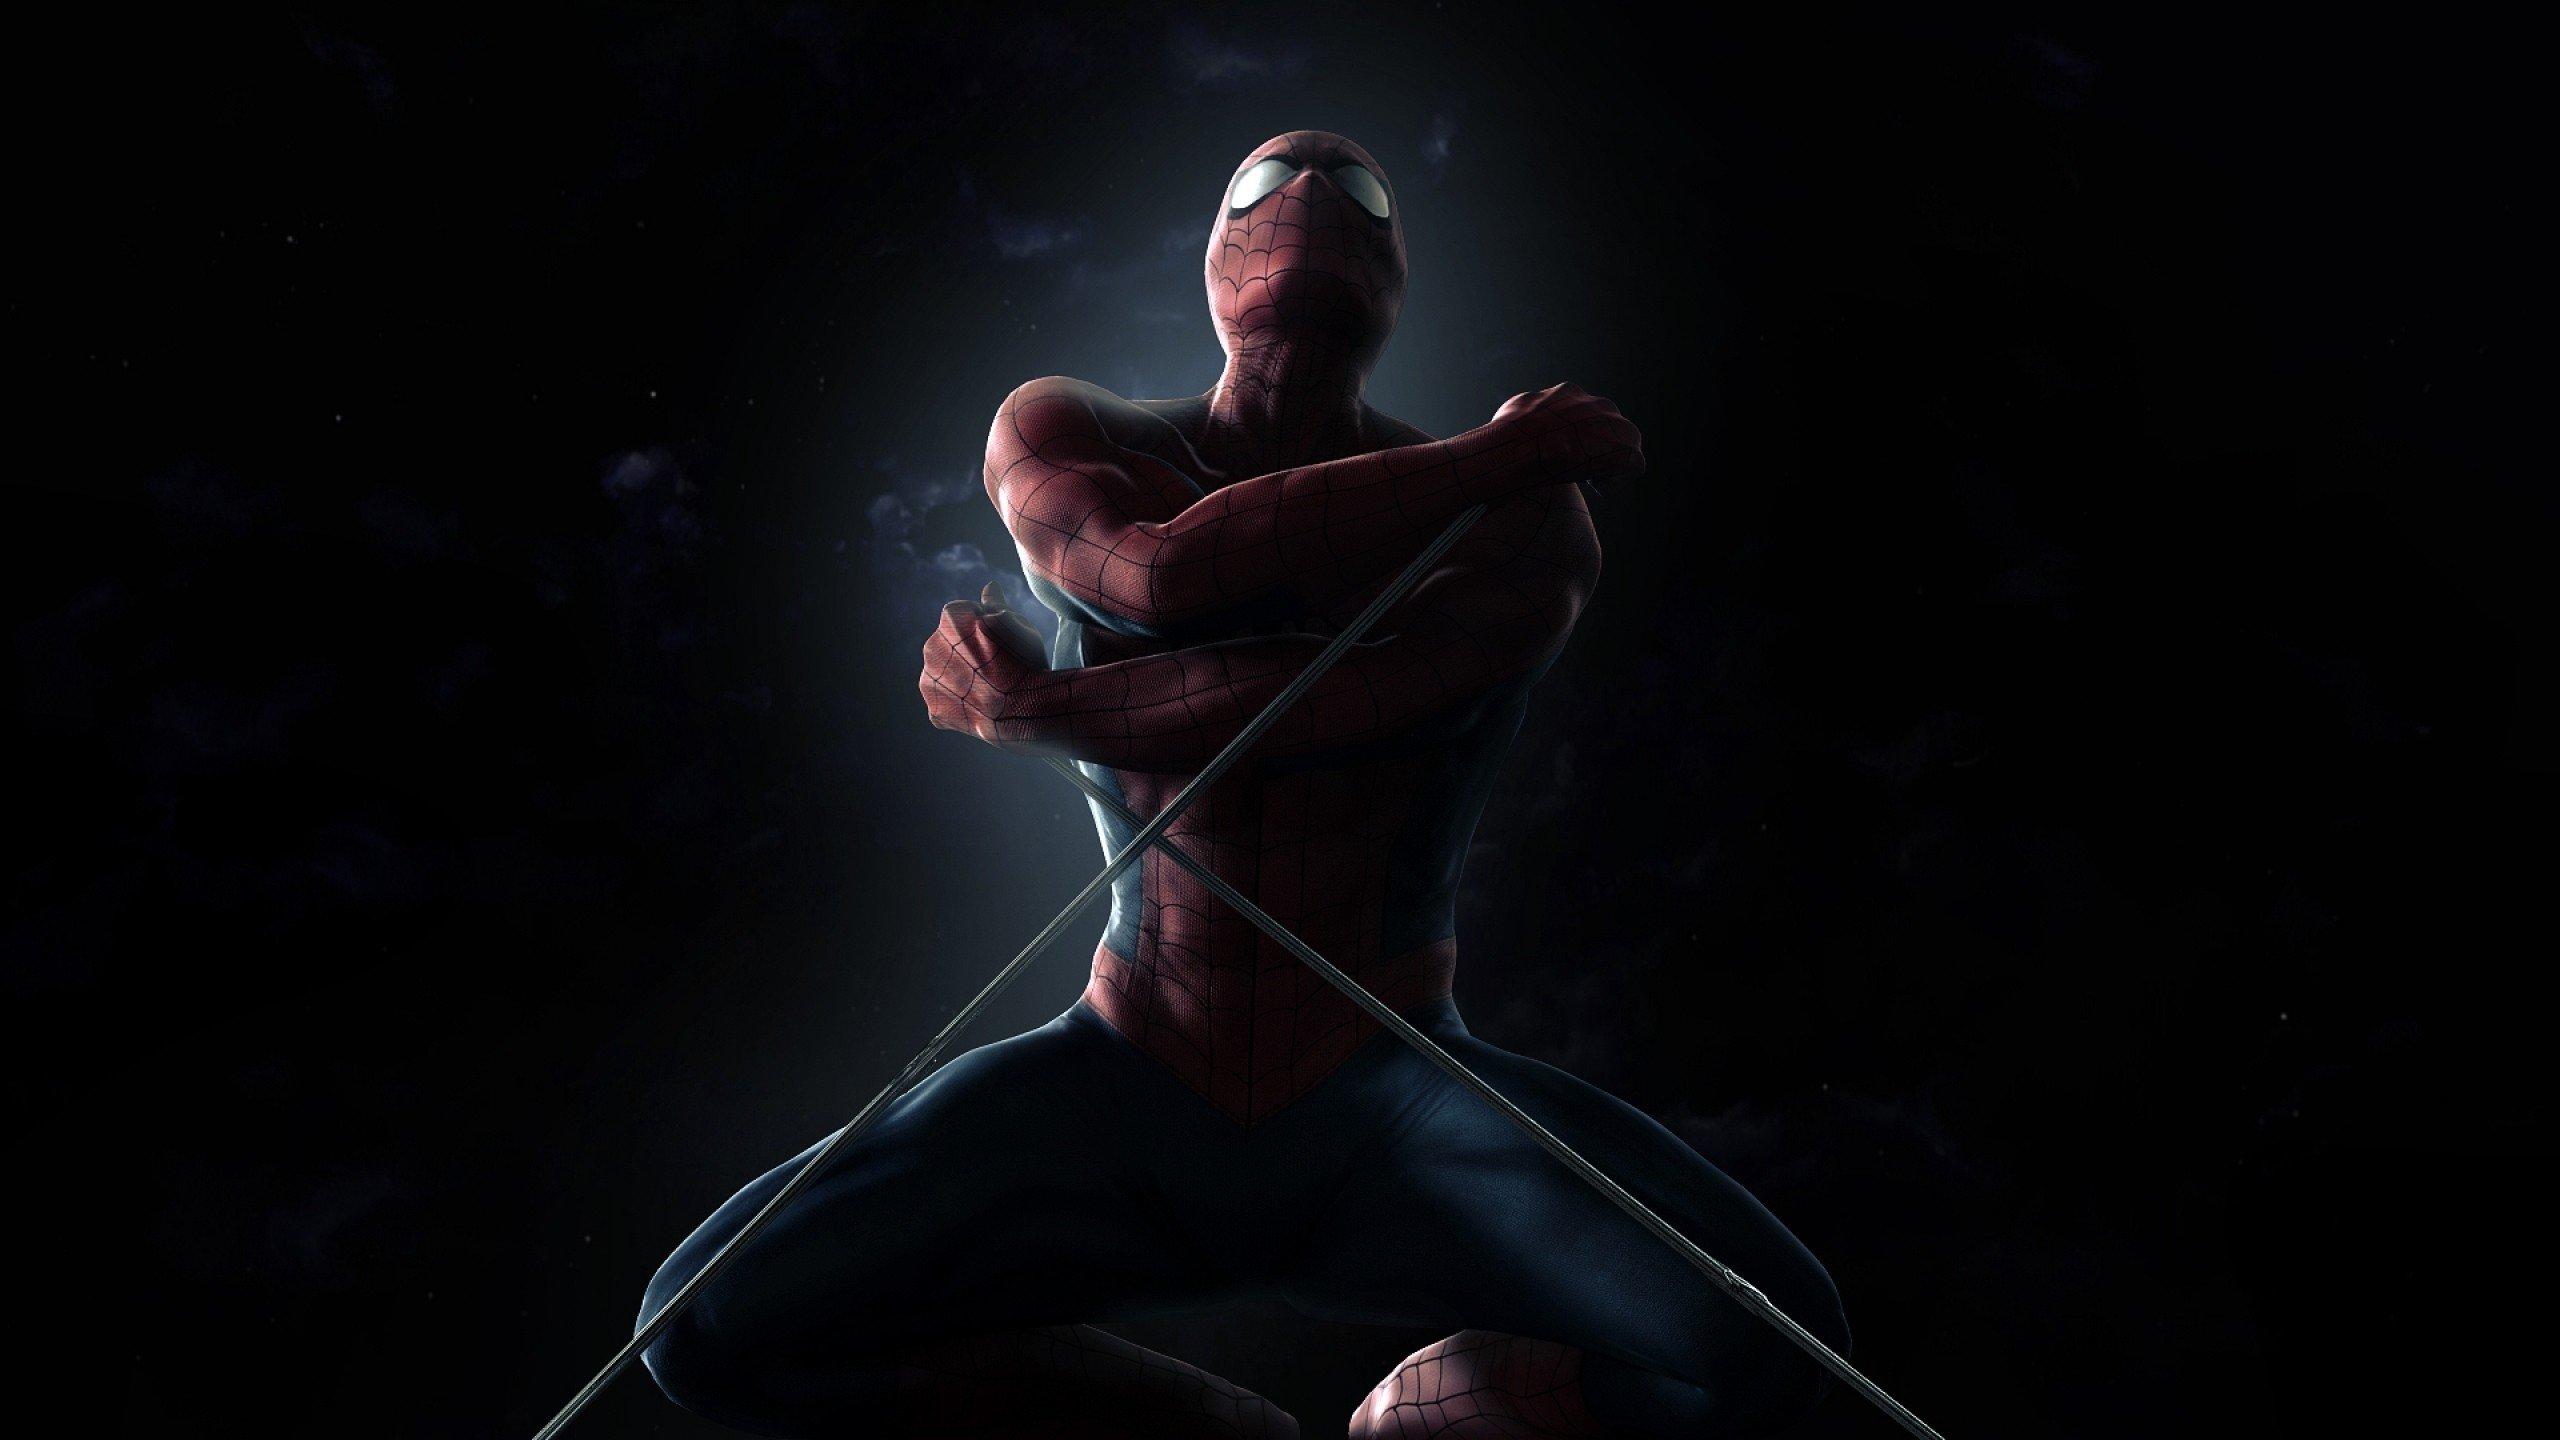 marvel comics wallpaper spider - photo #30